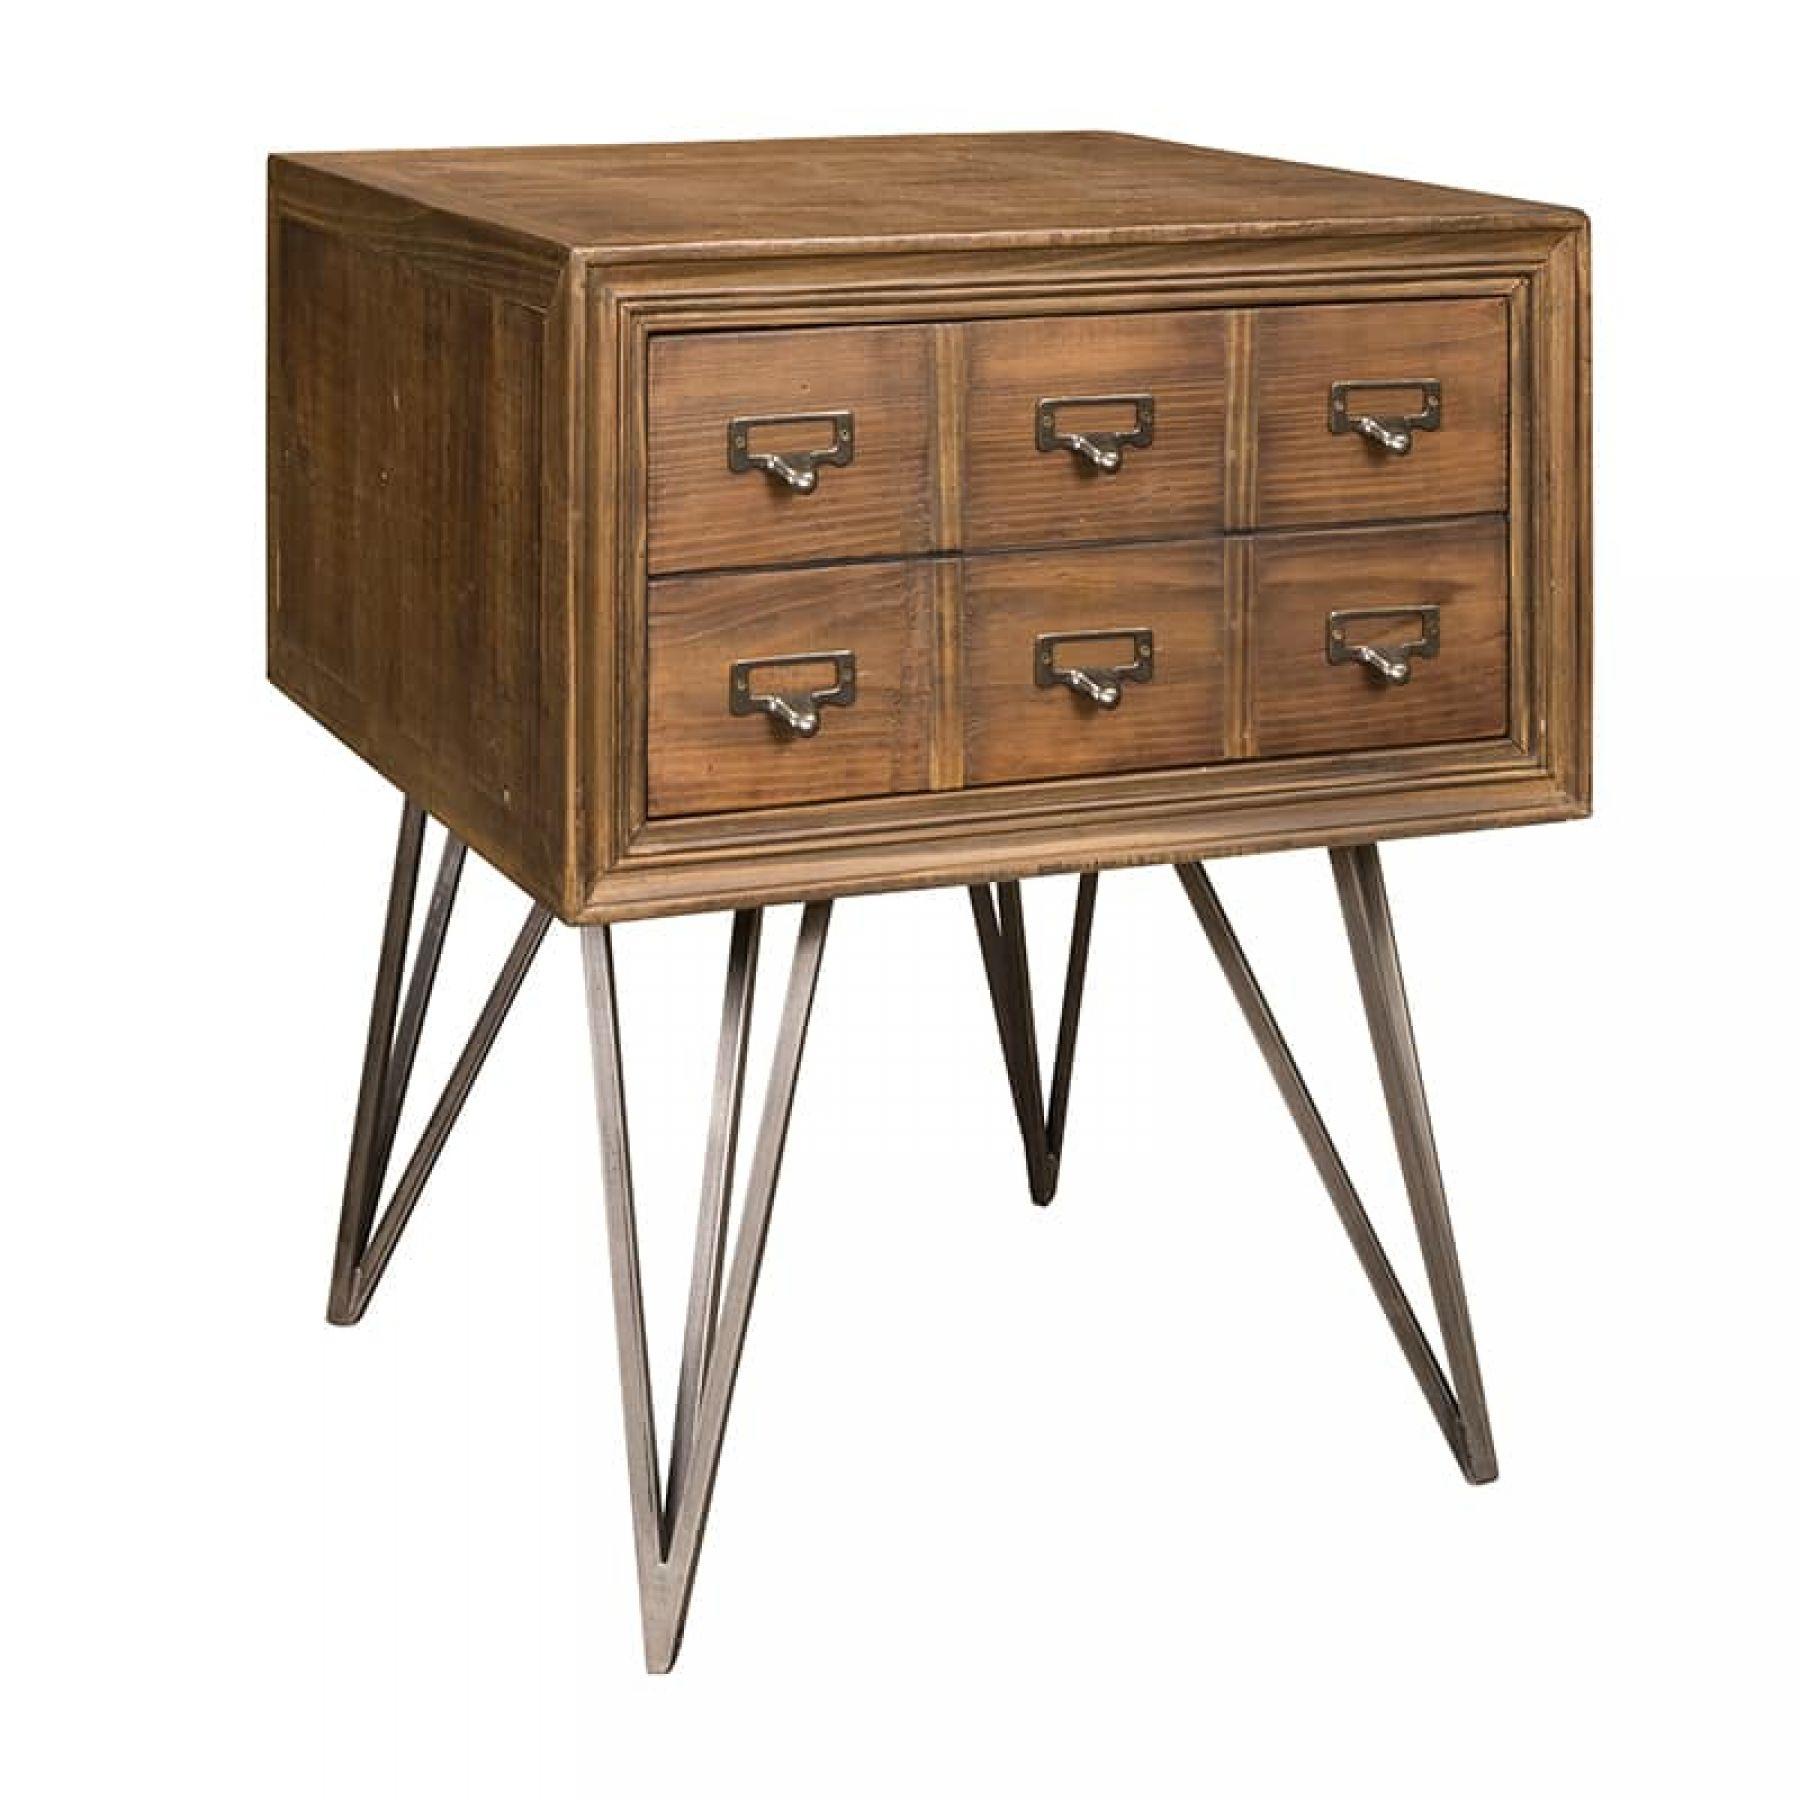 Magazzino corner table 1 drawer magazzino home occasional furniture corner table 1 drawer watchthetrailerfo